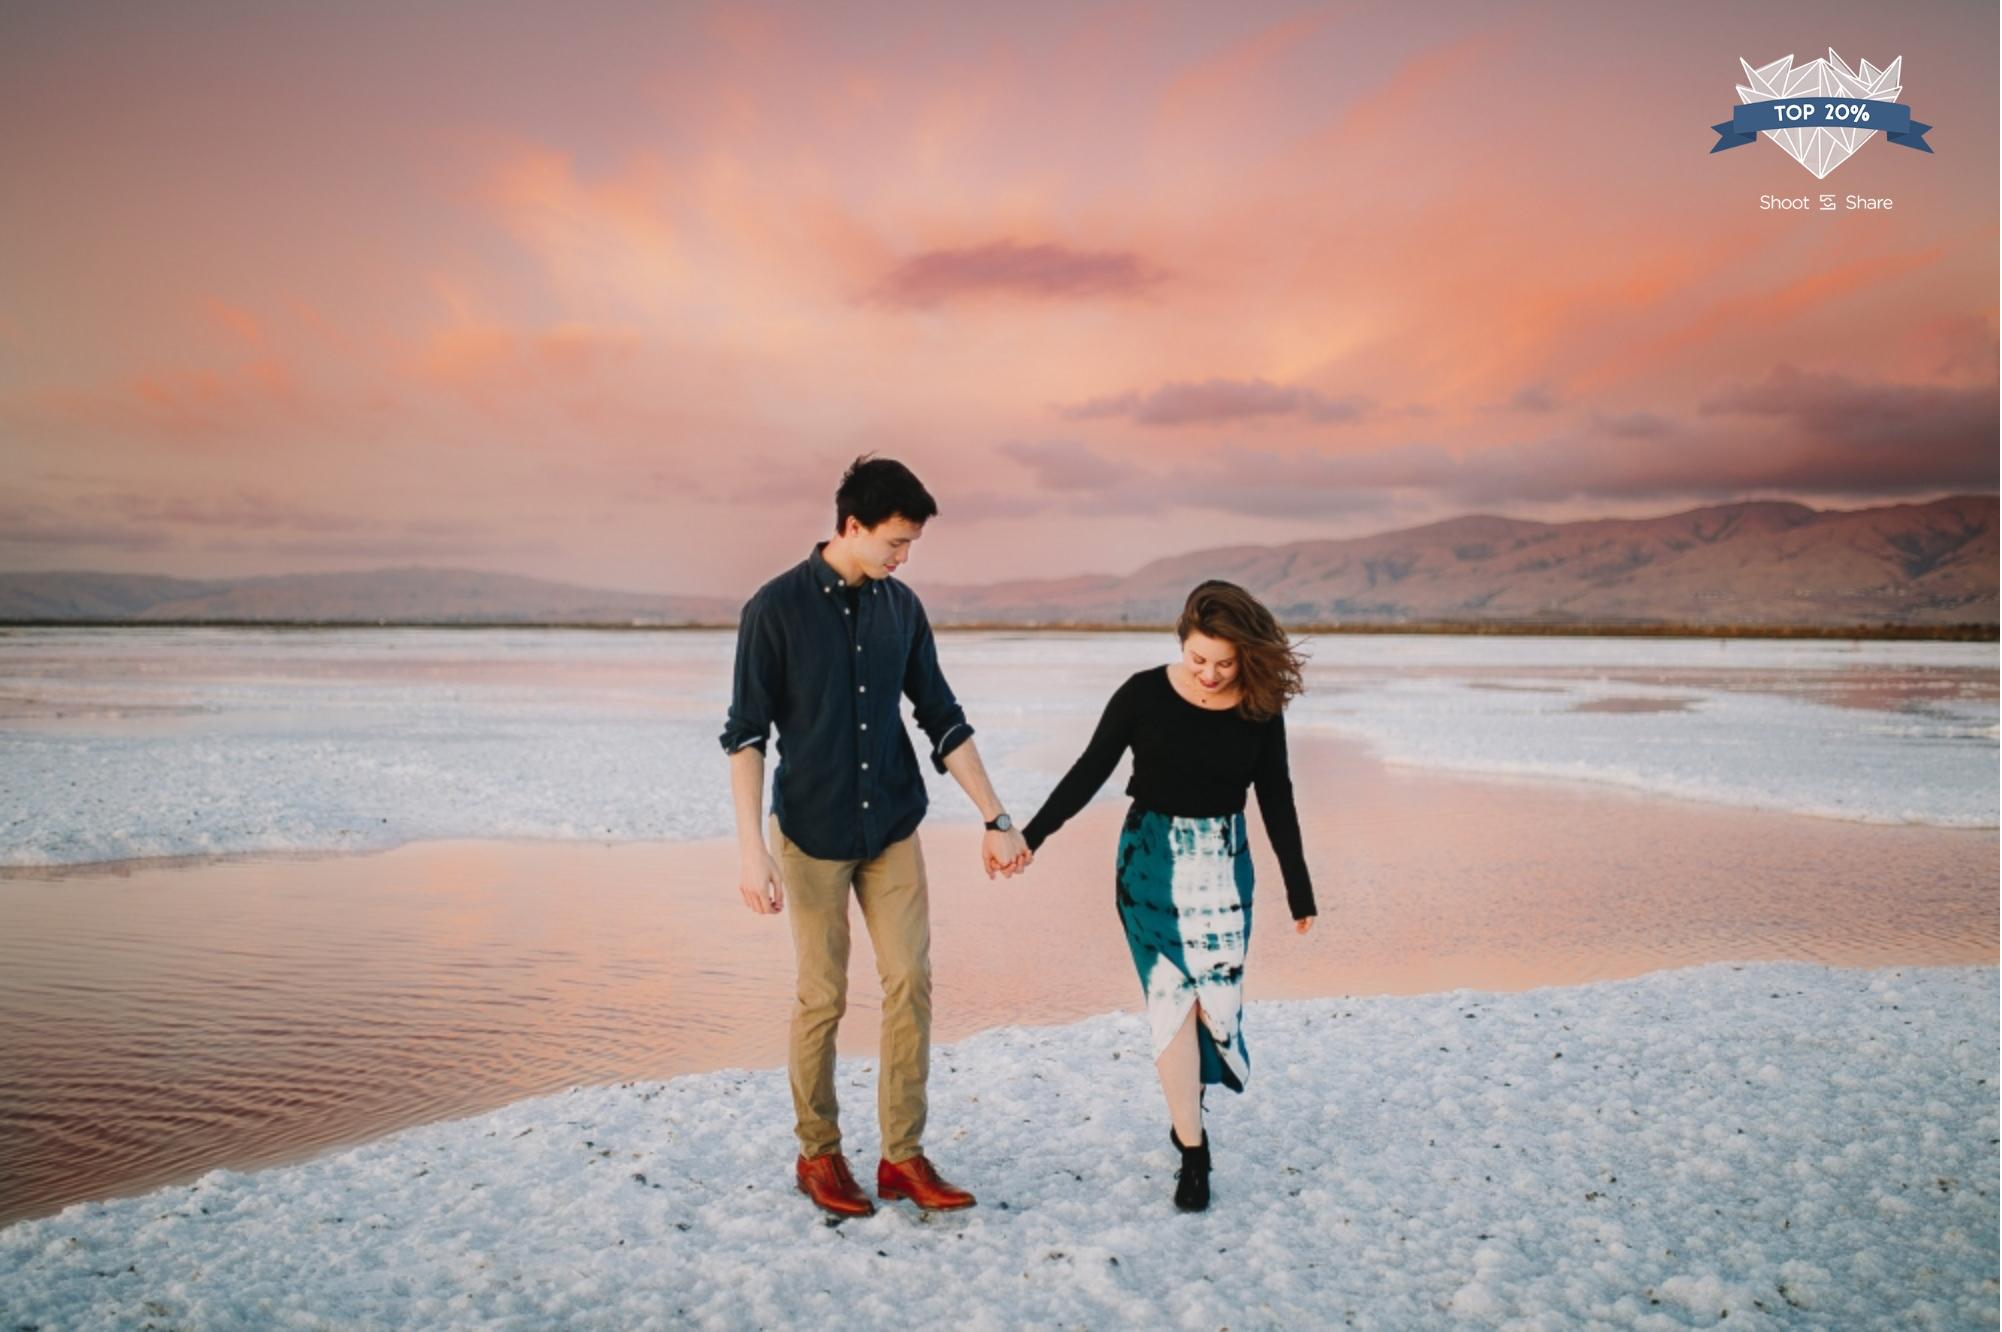 Archer Inspired Photography Shoot and Share Family Wedding Lifestyle Photographer Morgan Hill California San Francisco Bay Area-15.jpg